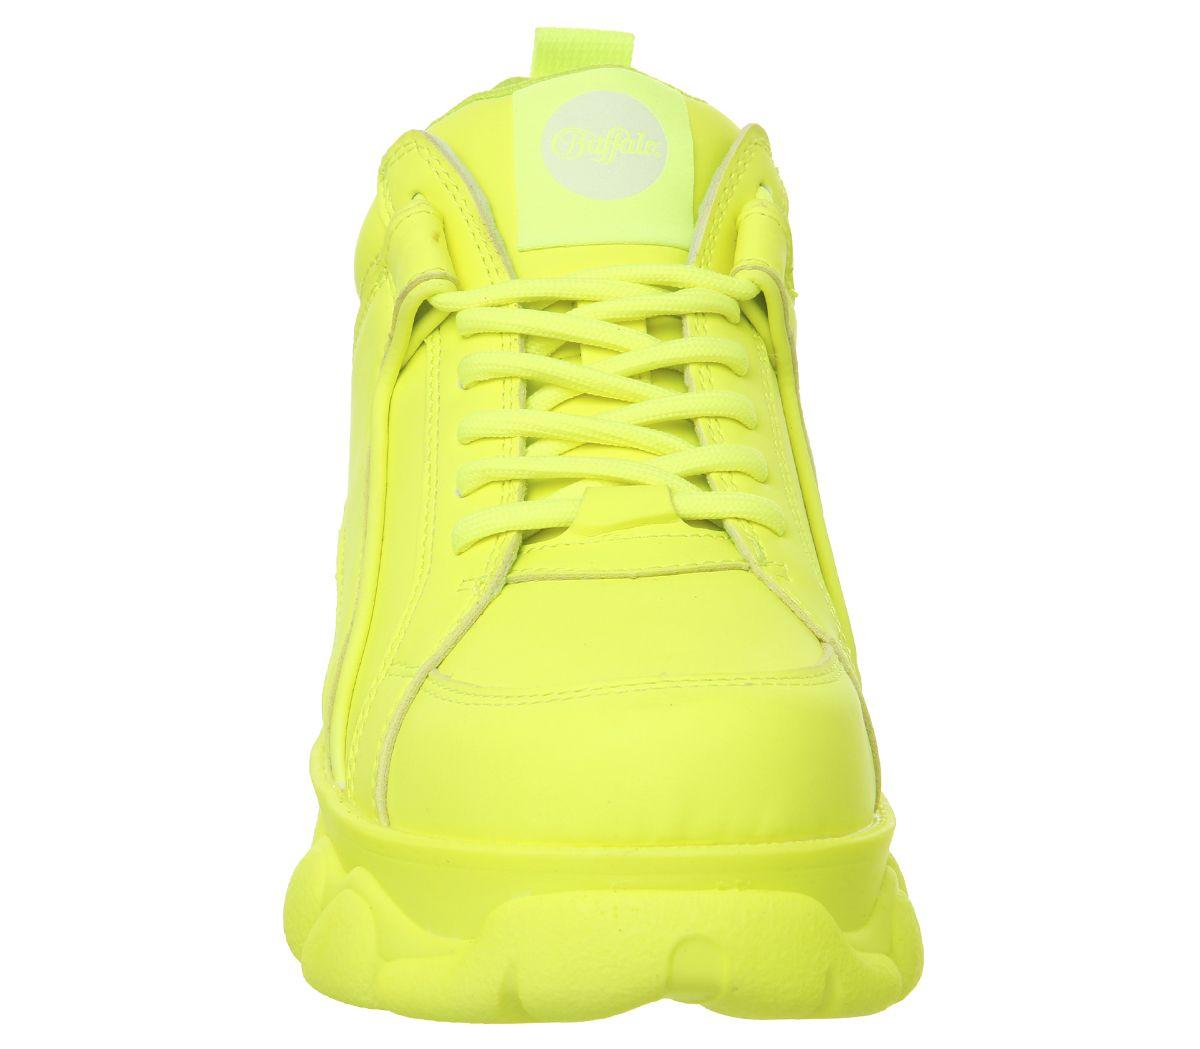 Buffalo Damen Neongelb TurnschuheEbay Corin Sneakers kwuTlZiOXP